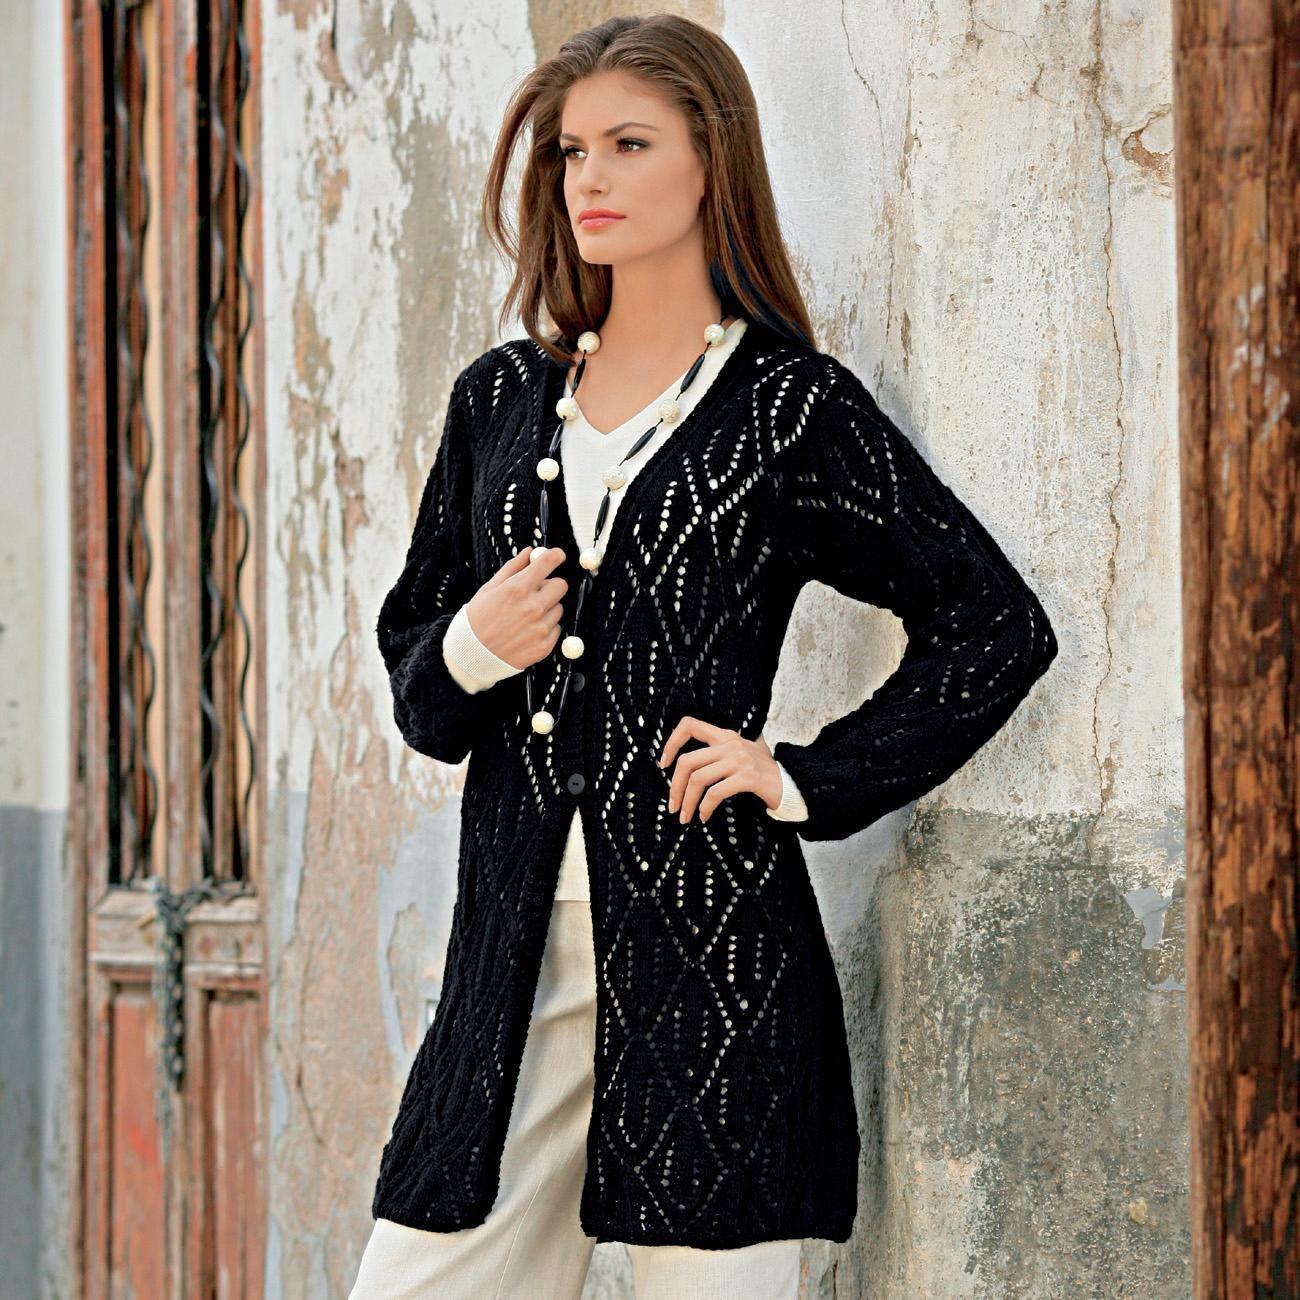 modell 168 9 lochmuster jacke aus revue von junghans wolle gro e gr en strickmodelle. Black Bedroom Furniture Sets. Home Design Ideas